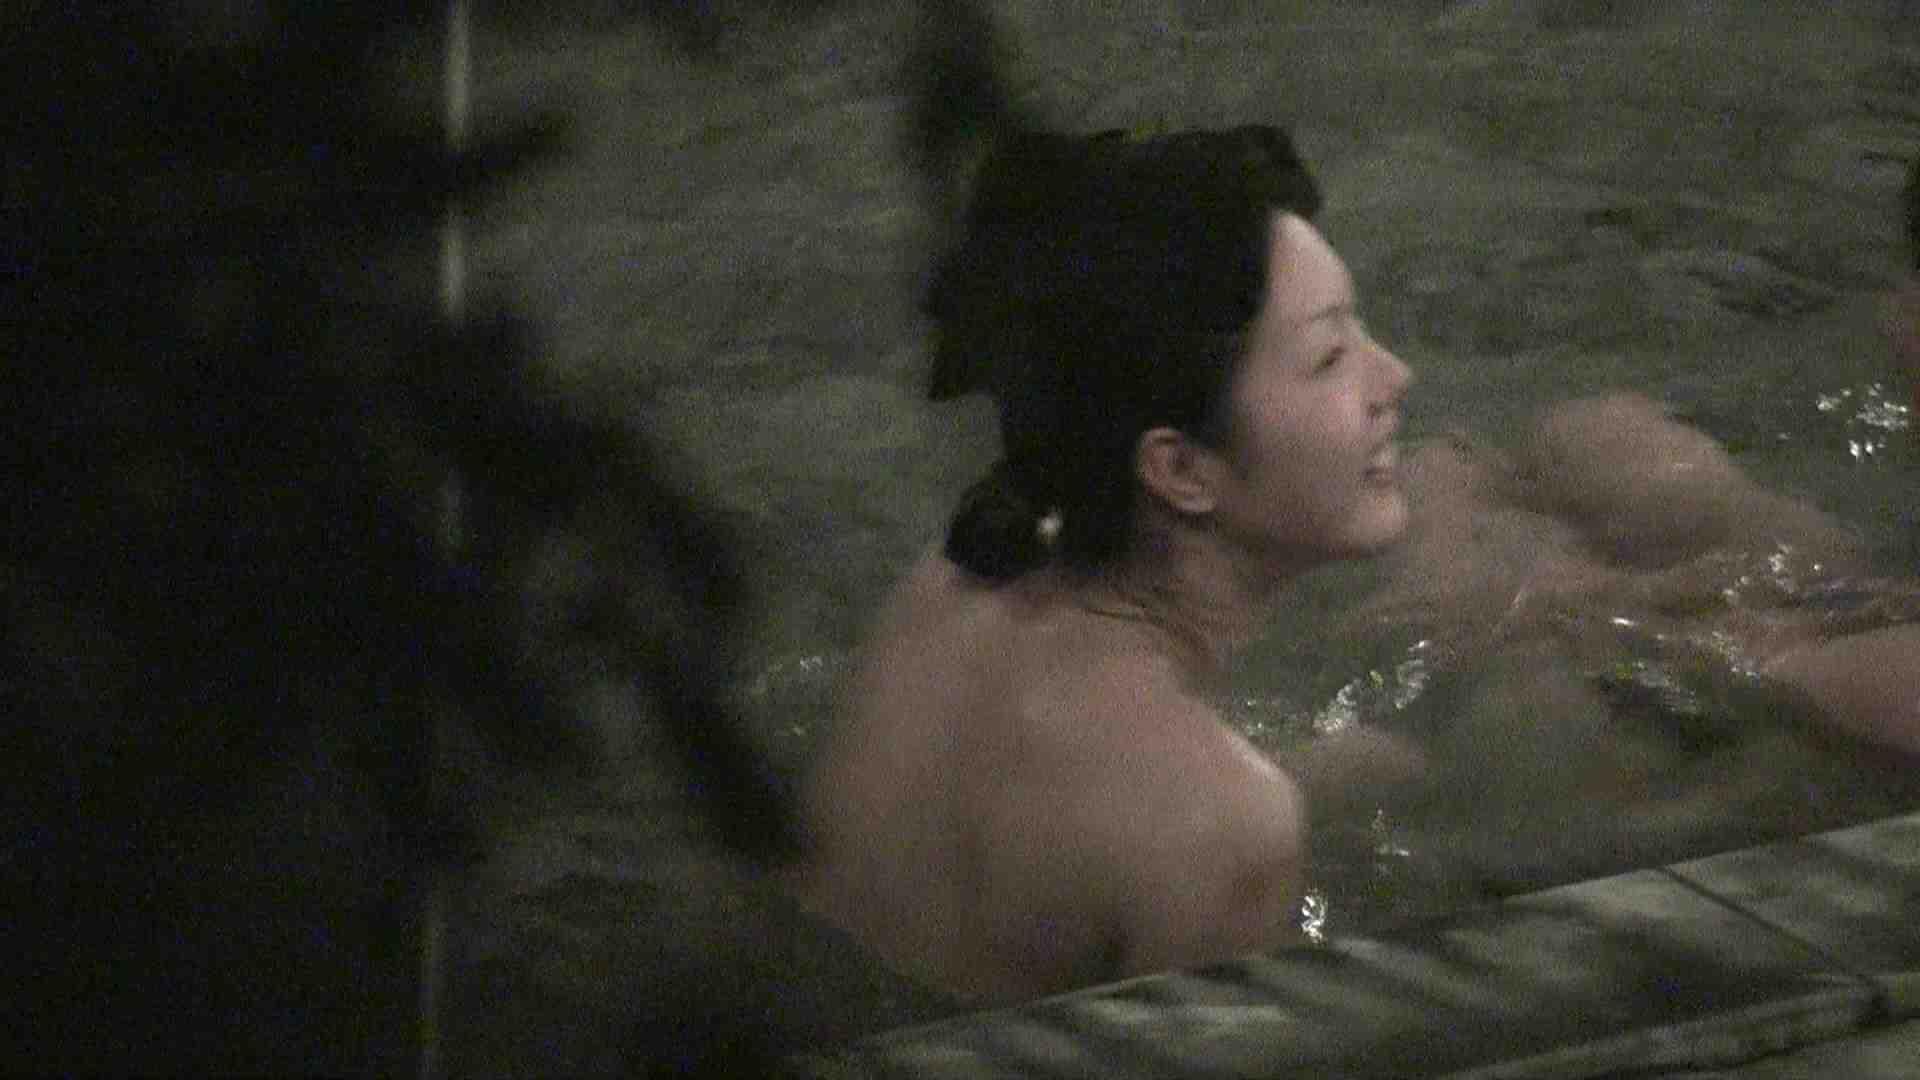 Aquaな露天風呂Vol.315 HなOL   盗撮  51pic 35